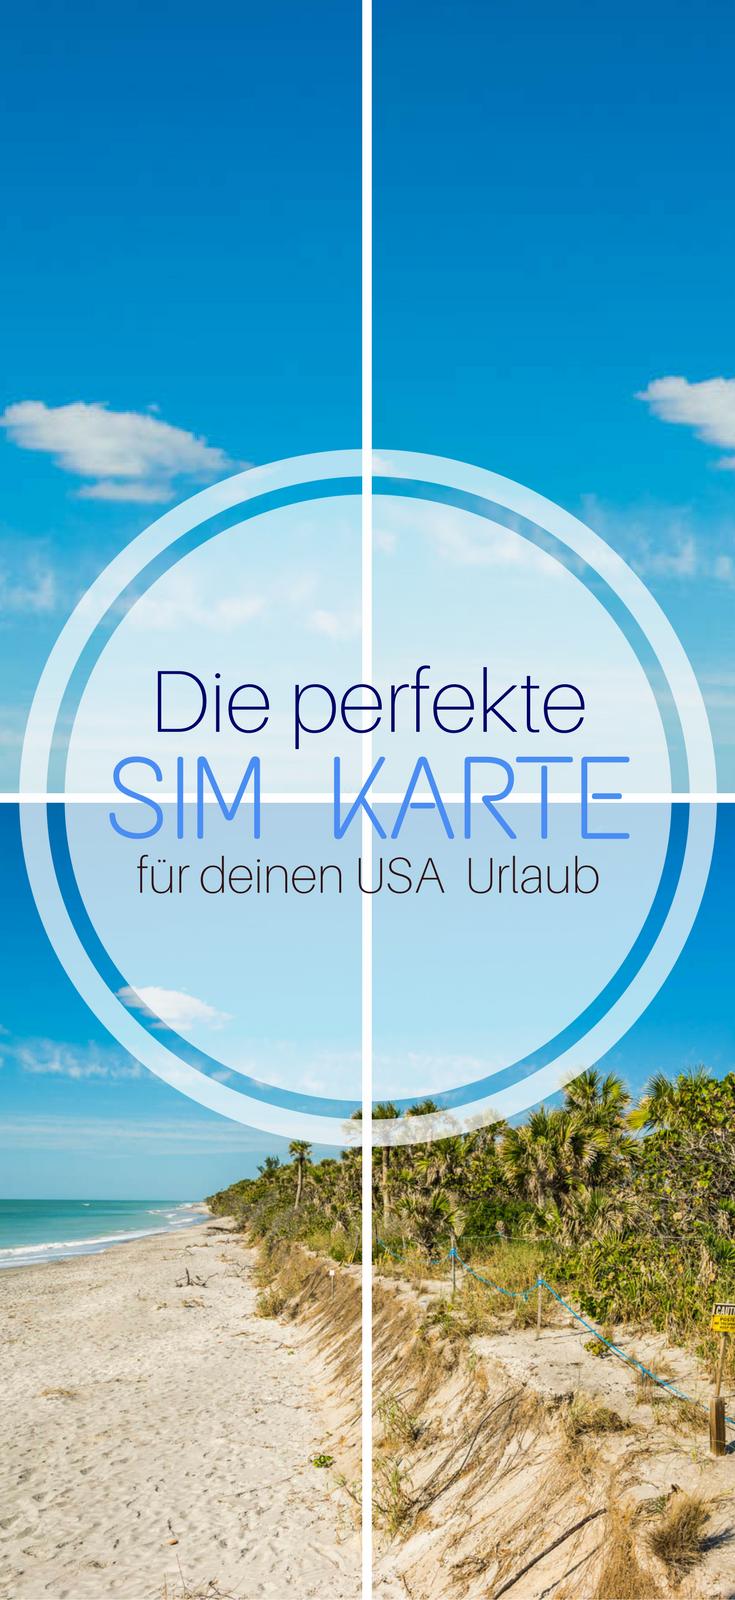 Sim Karte Usa Urlaub.Die Perfekte Sim Karte Für Deinen Usa Urlaub Reiseblog Ai See The